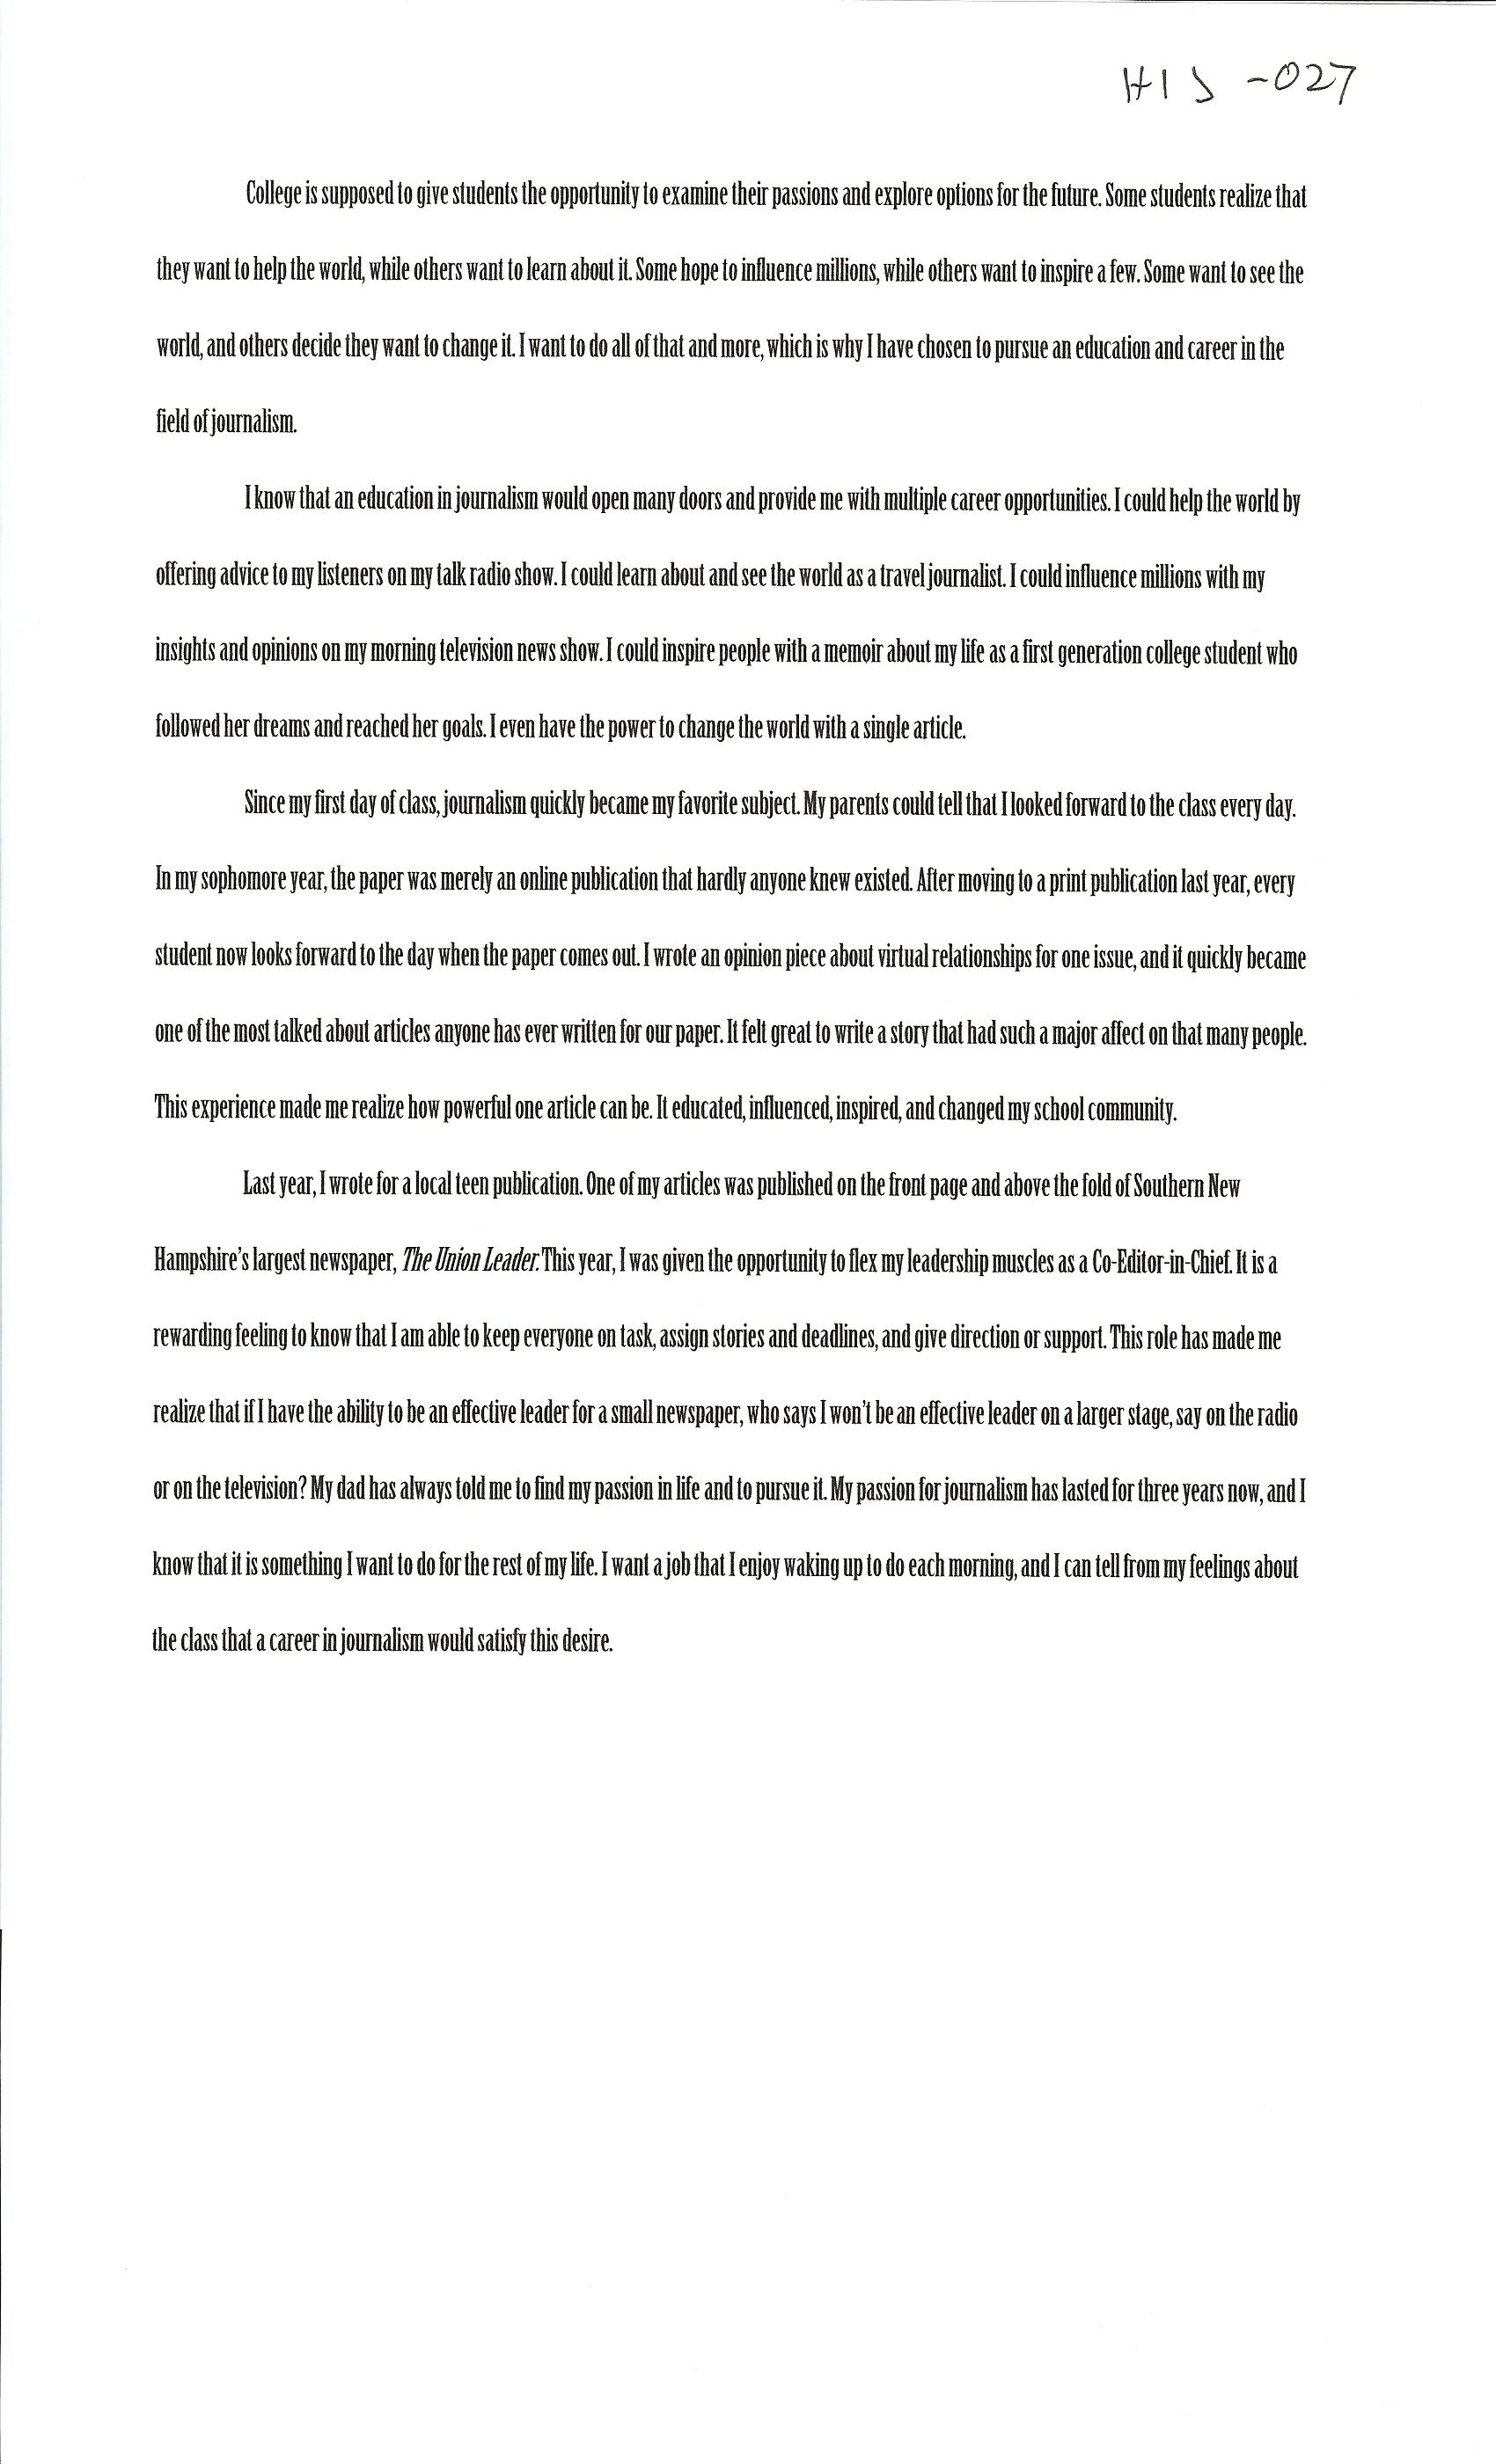 013 Winning Scholarship Essay Examples Example Alexa Serrecchia Stupendous College Pdf Full